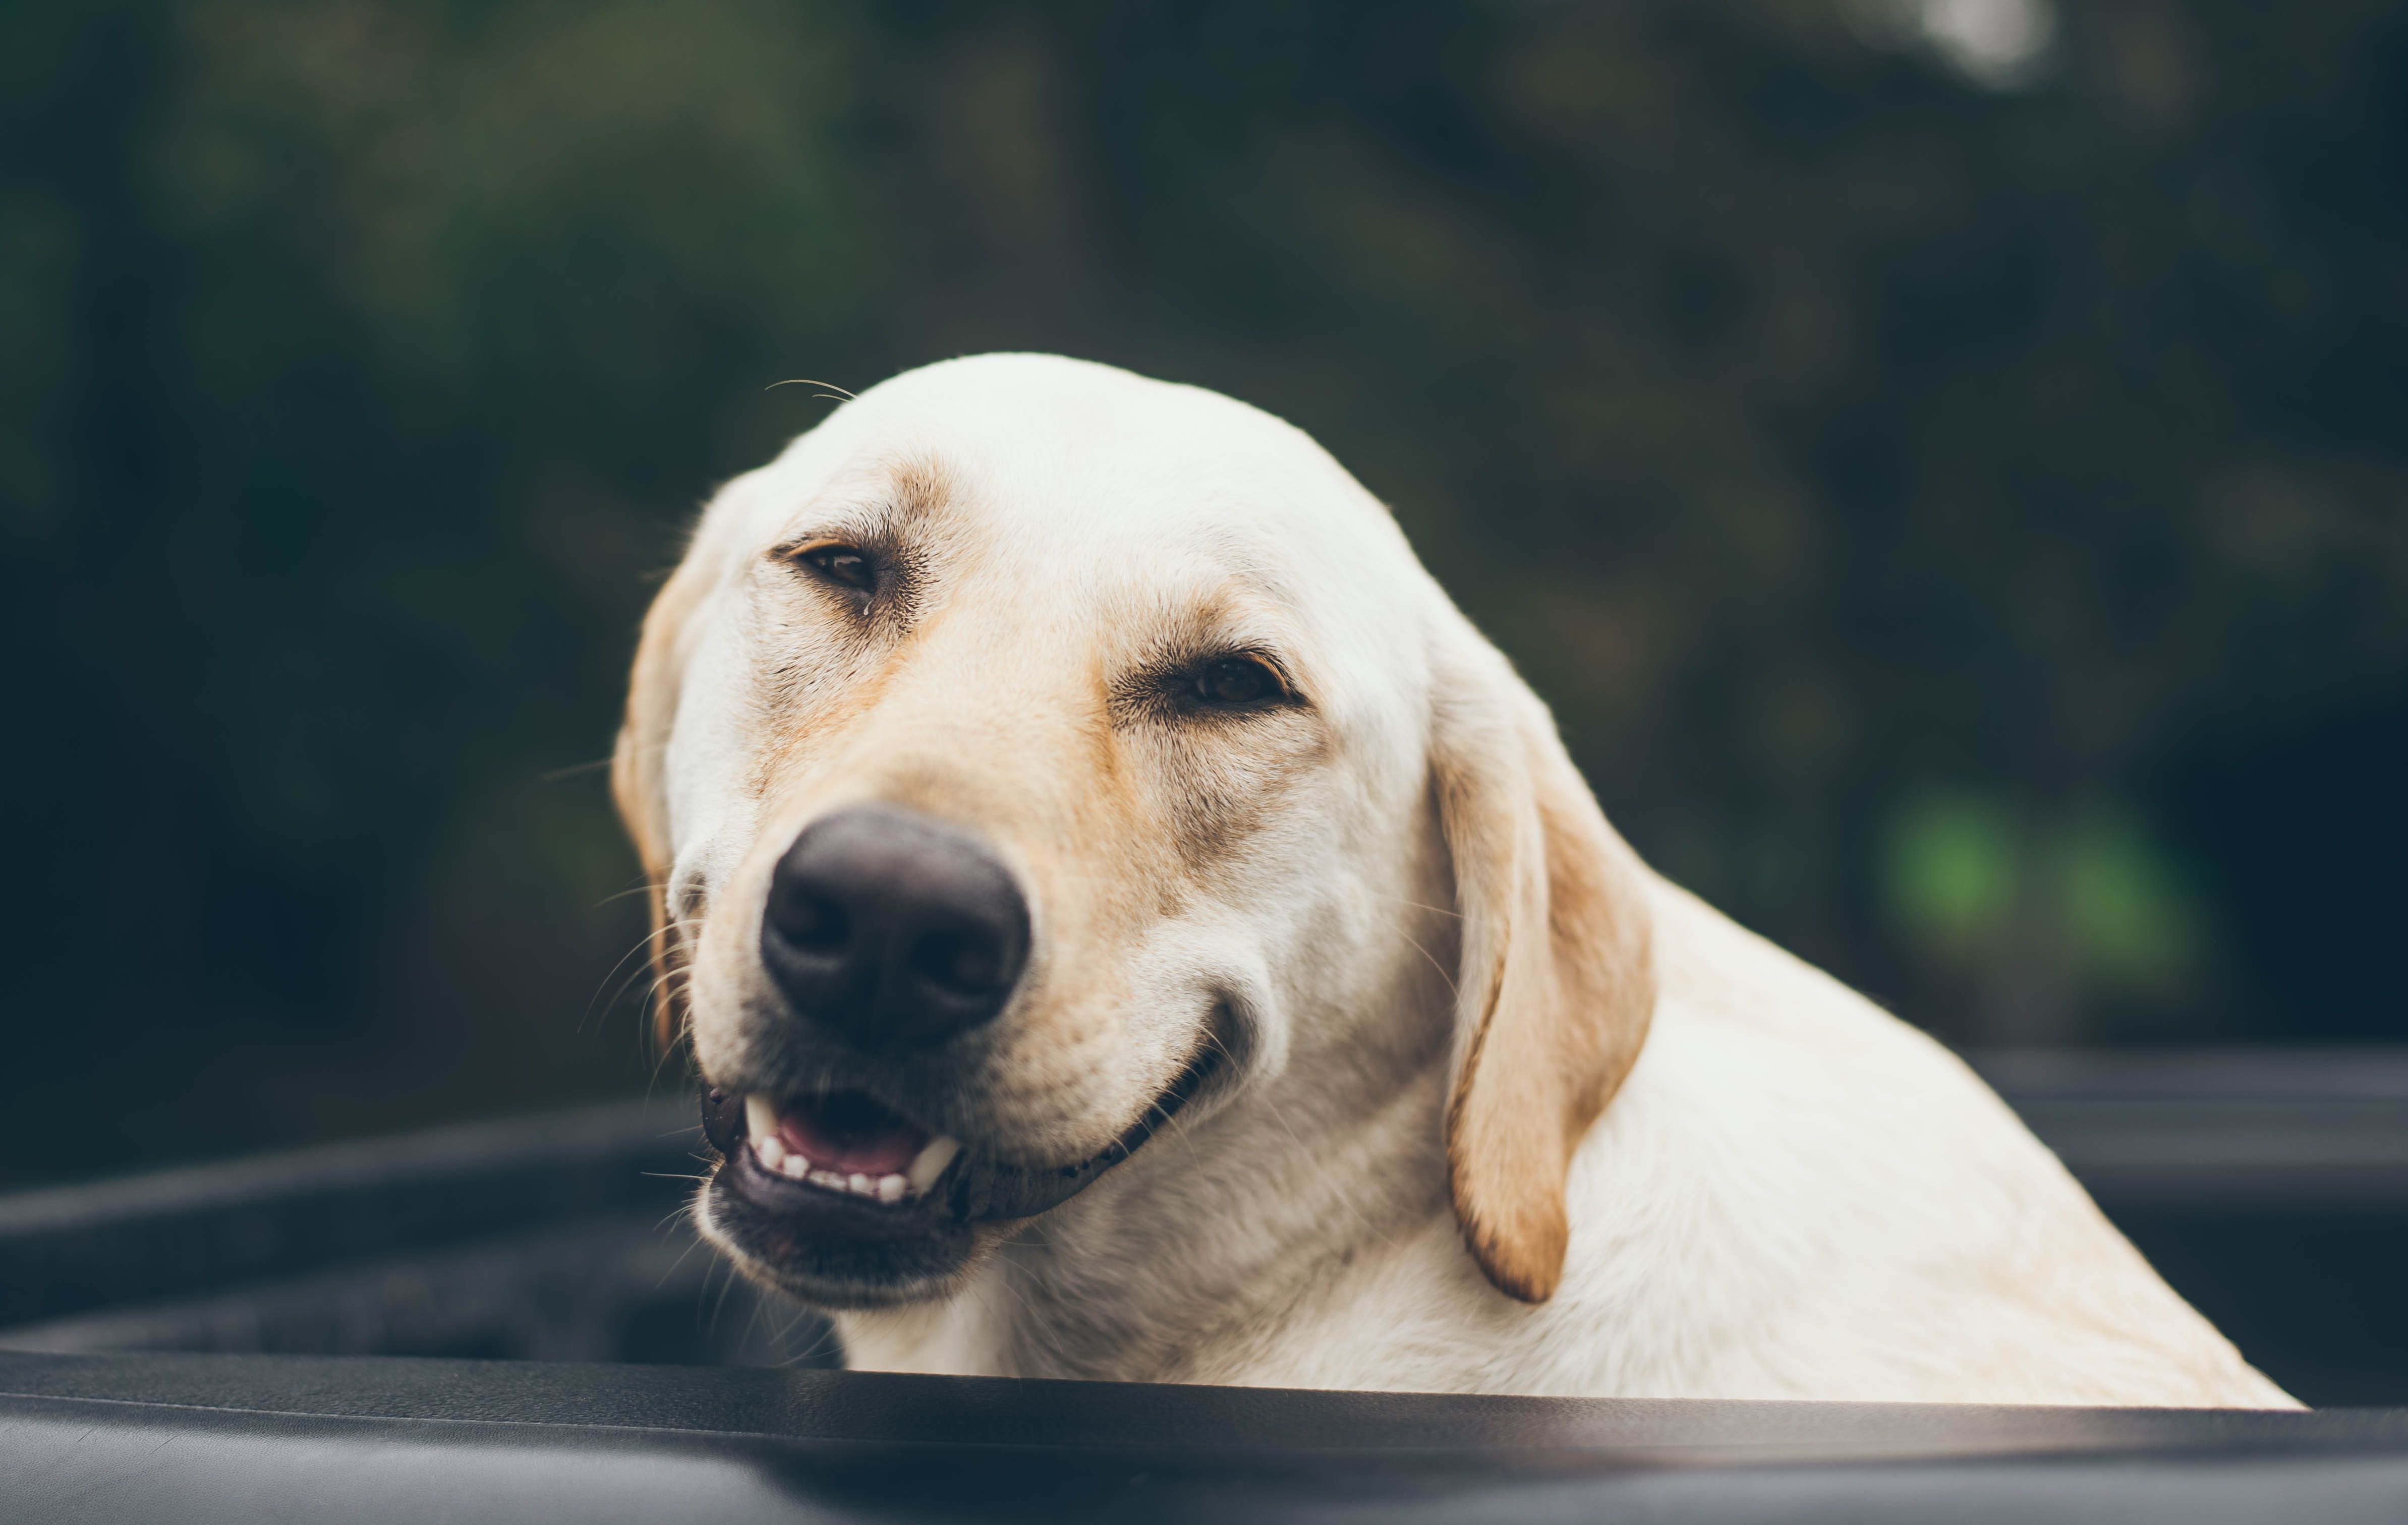 A funny dog